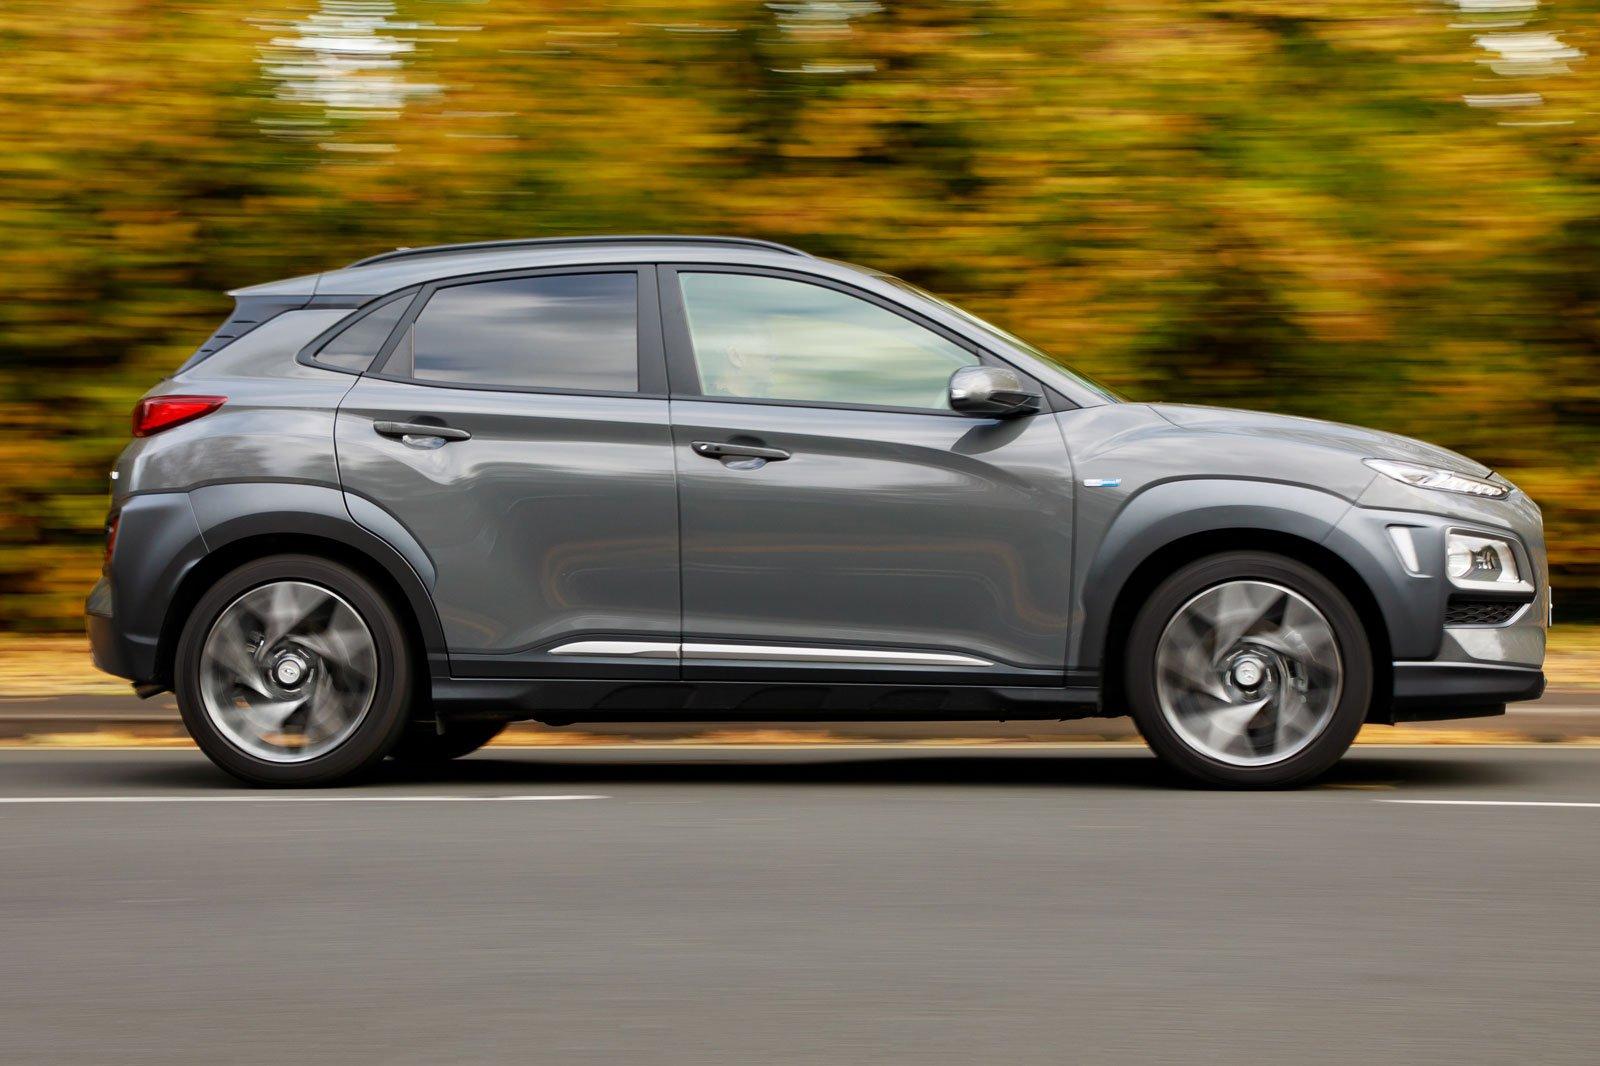 2019 hyundai kona hybrid gray driving side profile